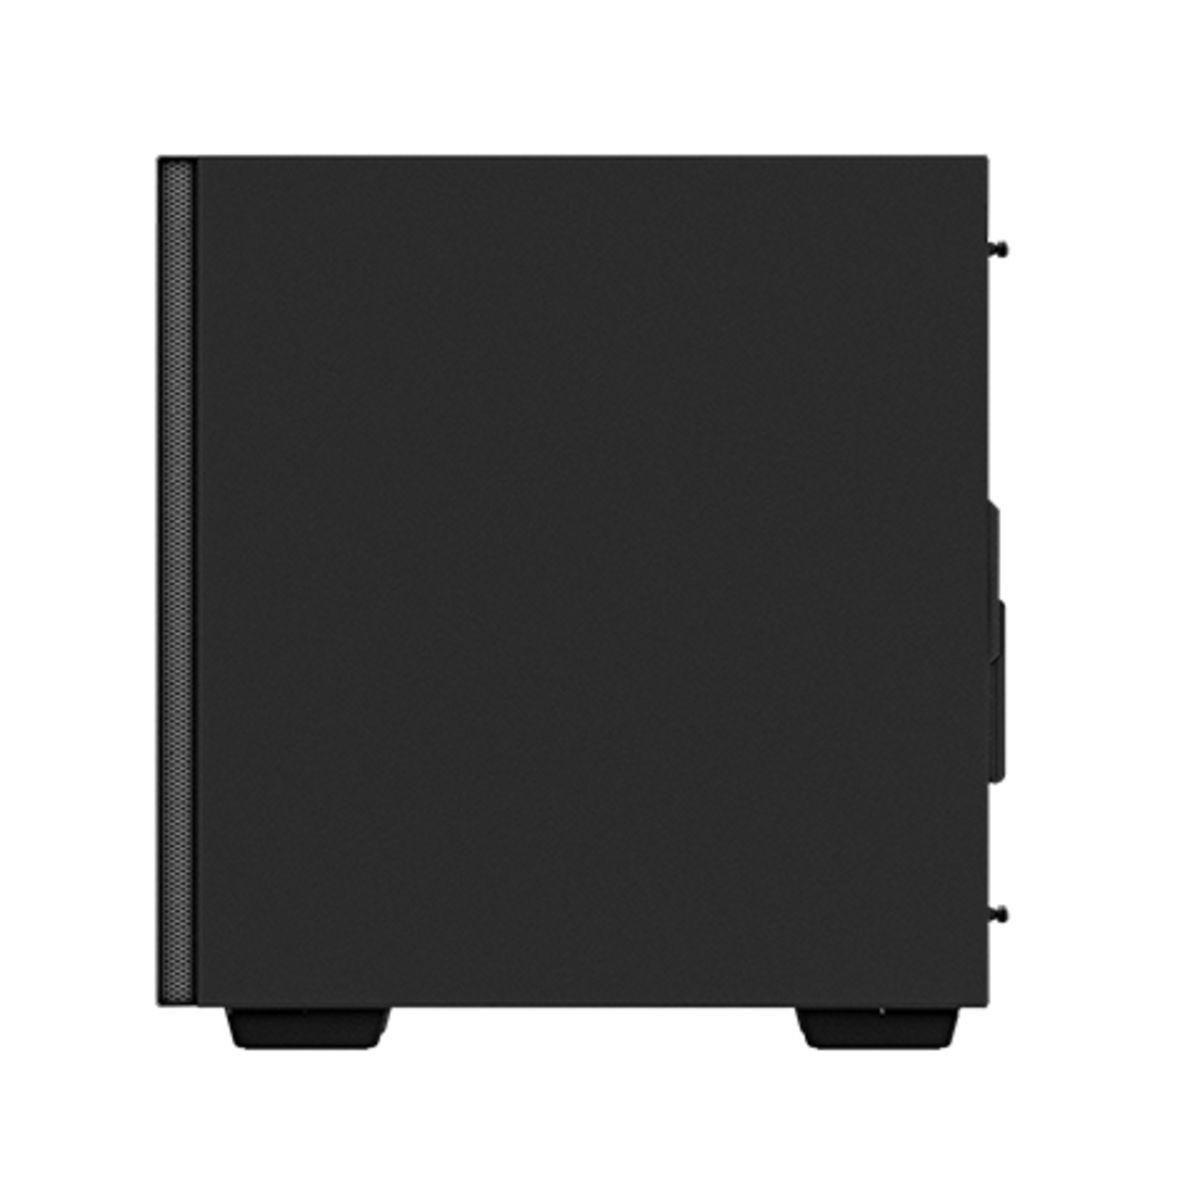 Gabinete Gamer DeepCool Macube 110, Mid Tower, Vidro Temperado, Black, Sem Fonte, Sem Fan, R-MACUBE110-BKNGM0NB-1